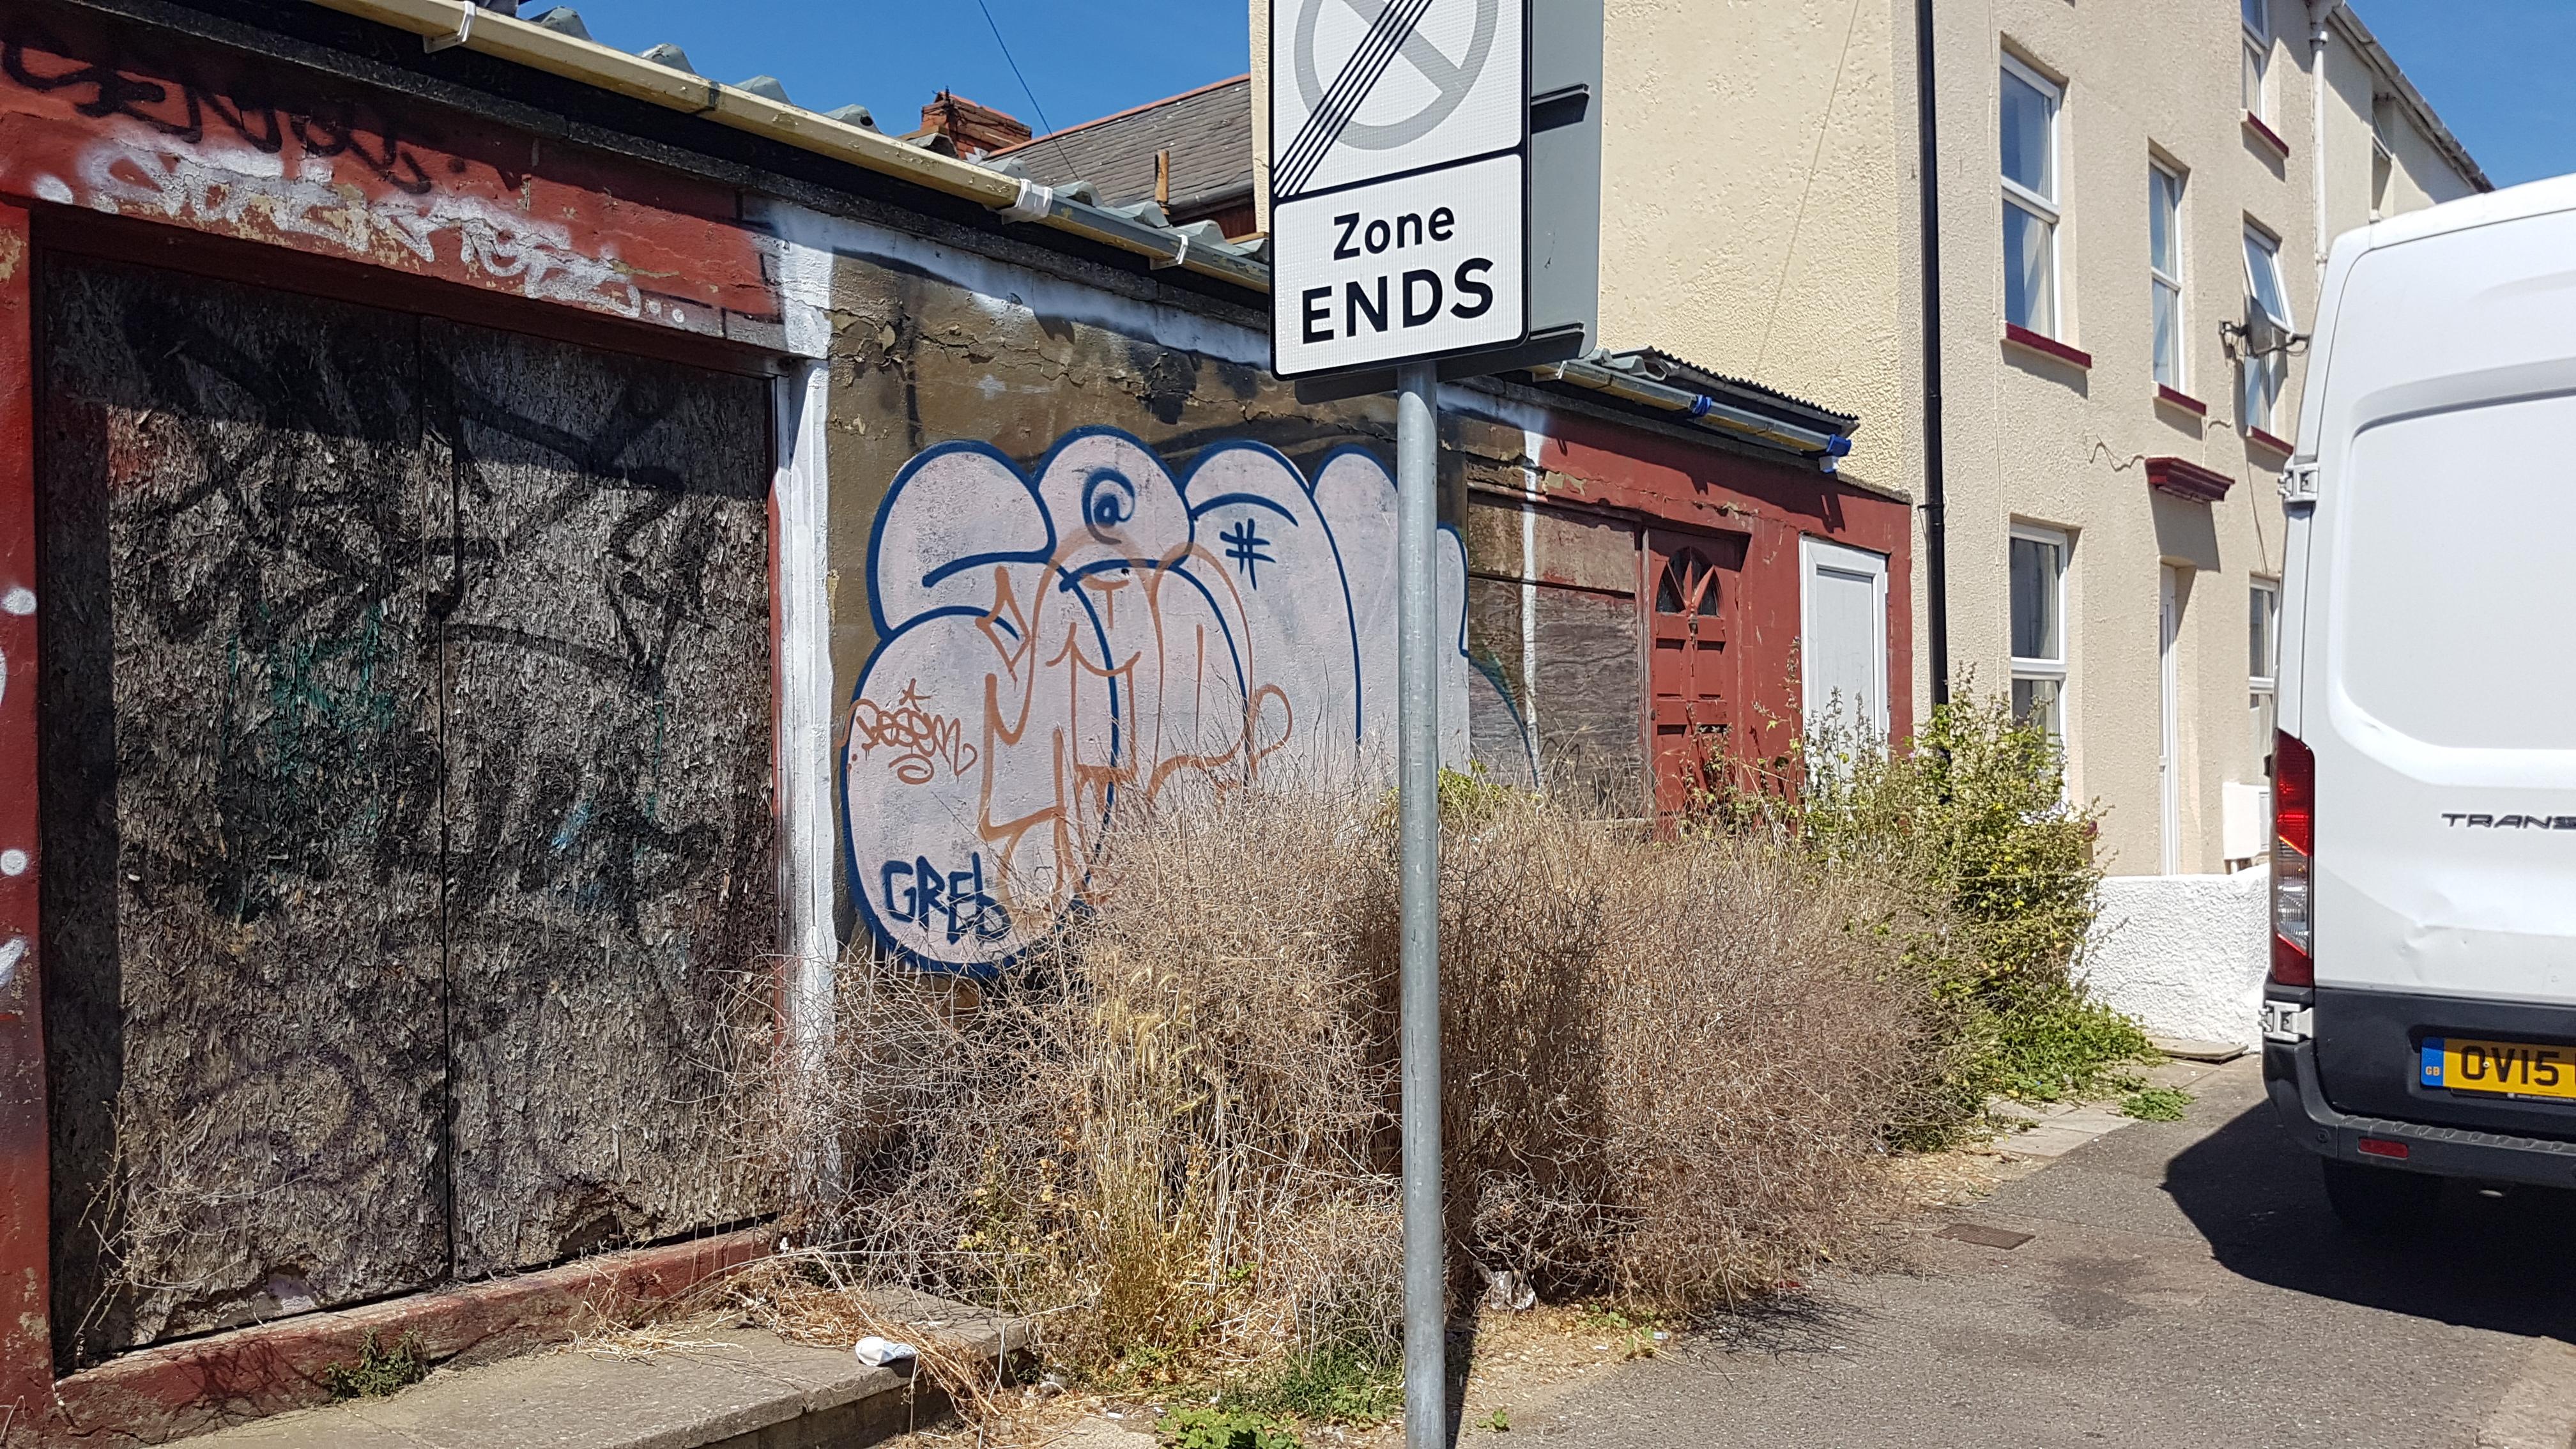 Queen Street, Folkestone